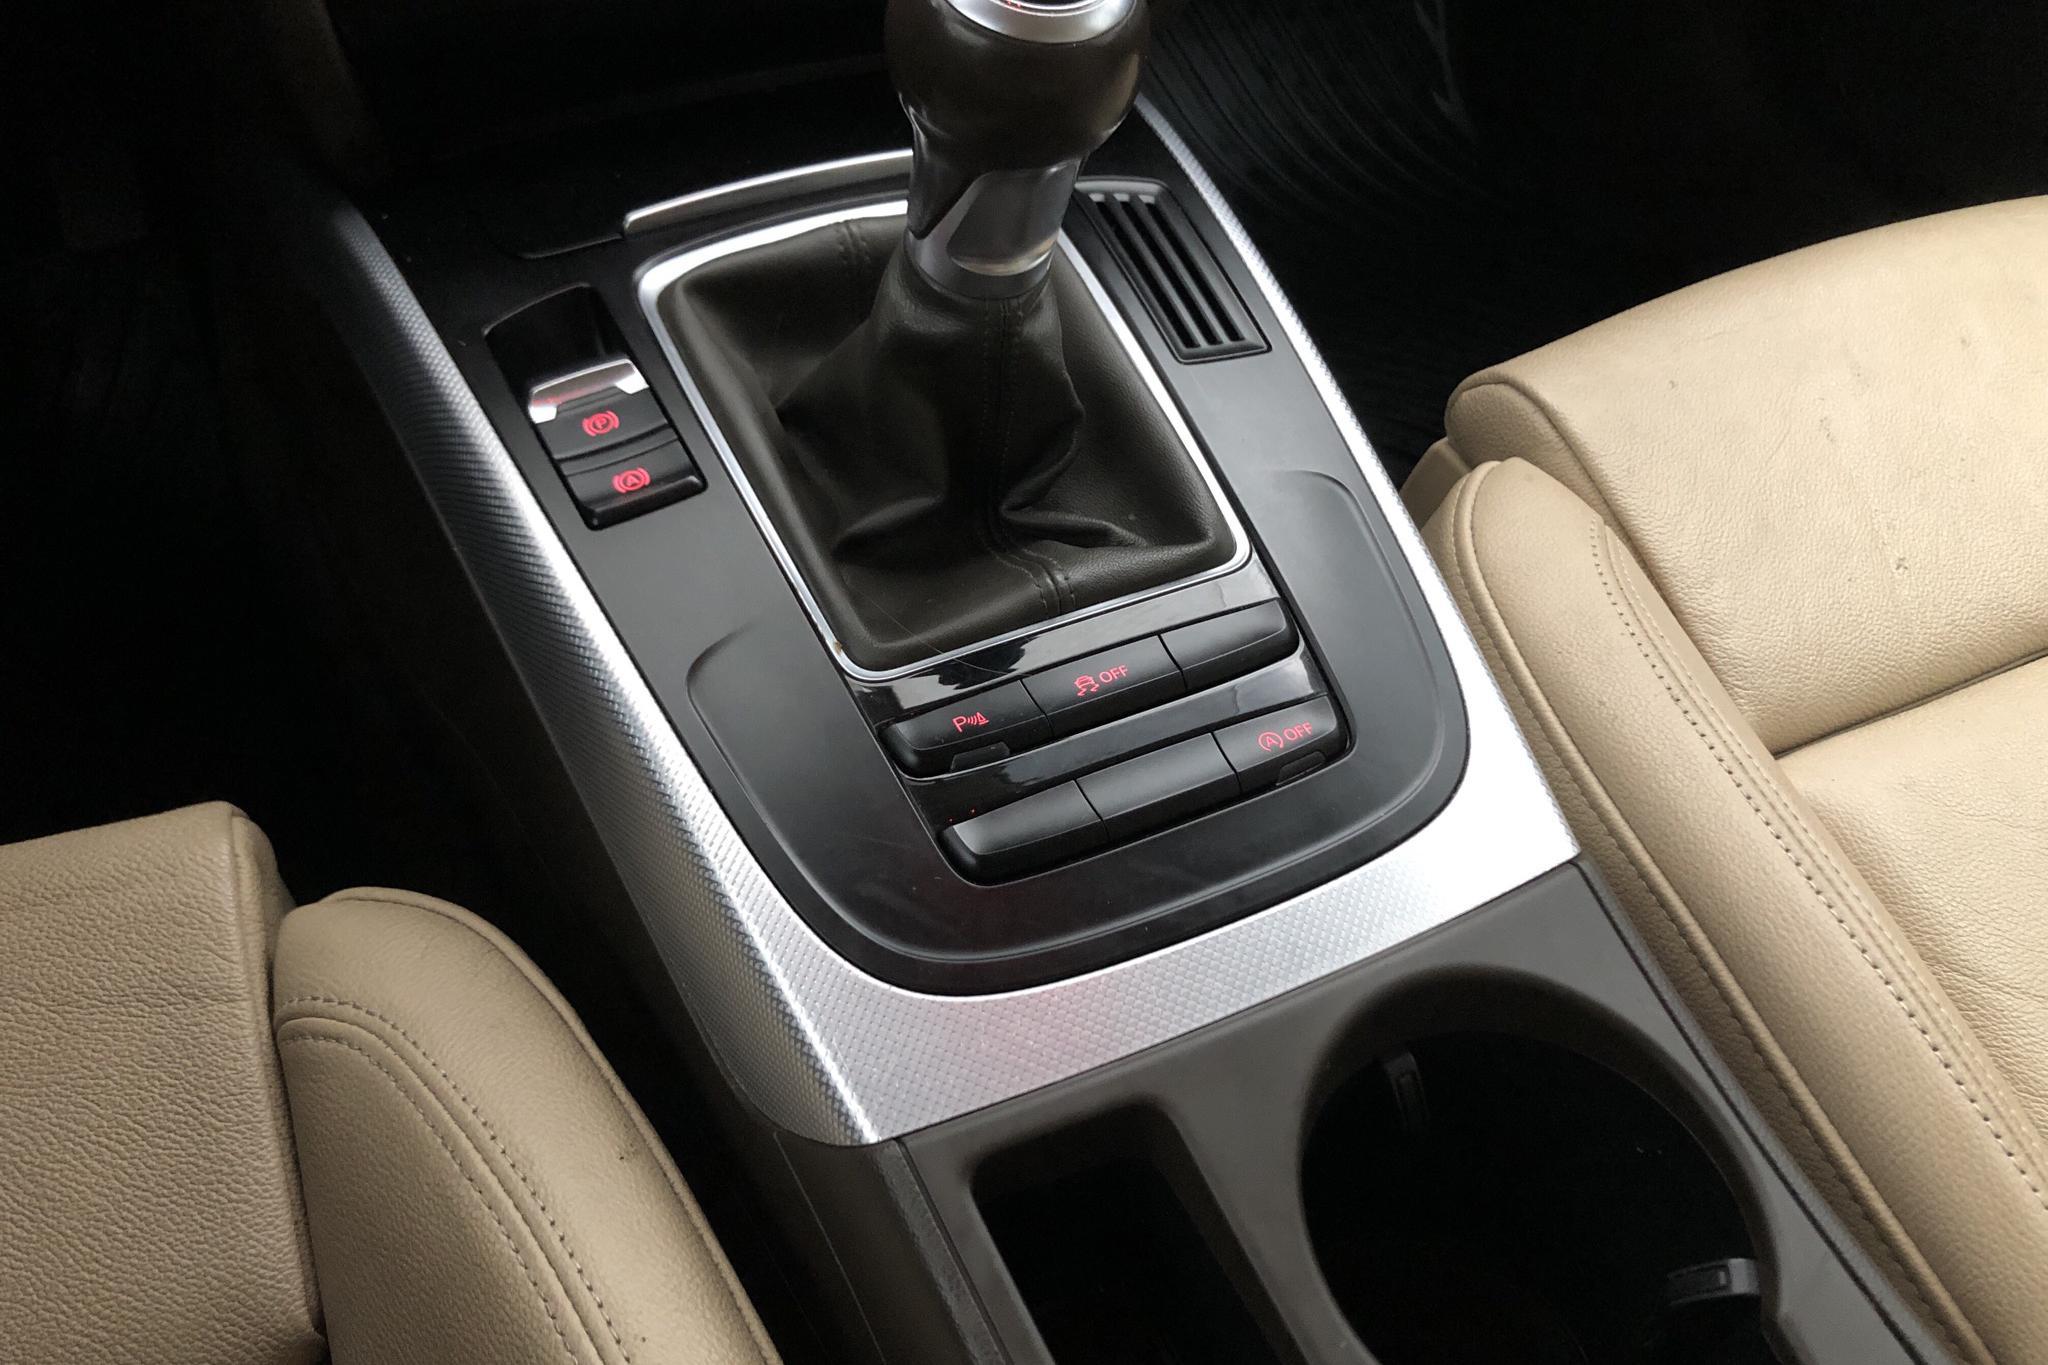 Audi A5 2.0 TDI Sportback quattro (177hk) - 148 530 km - Manual - gray - 2012